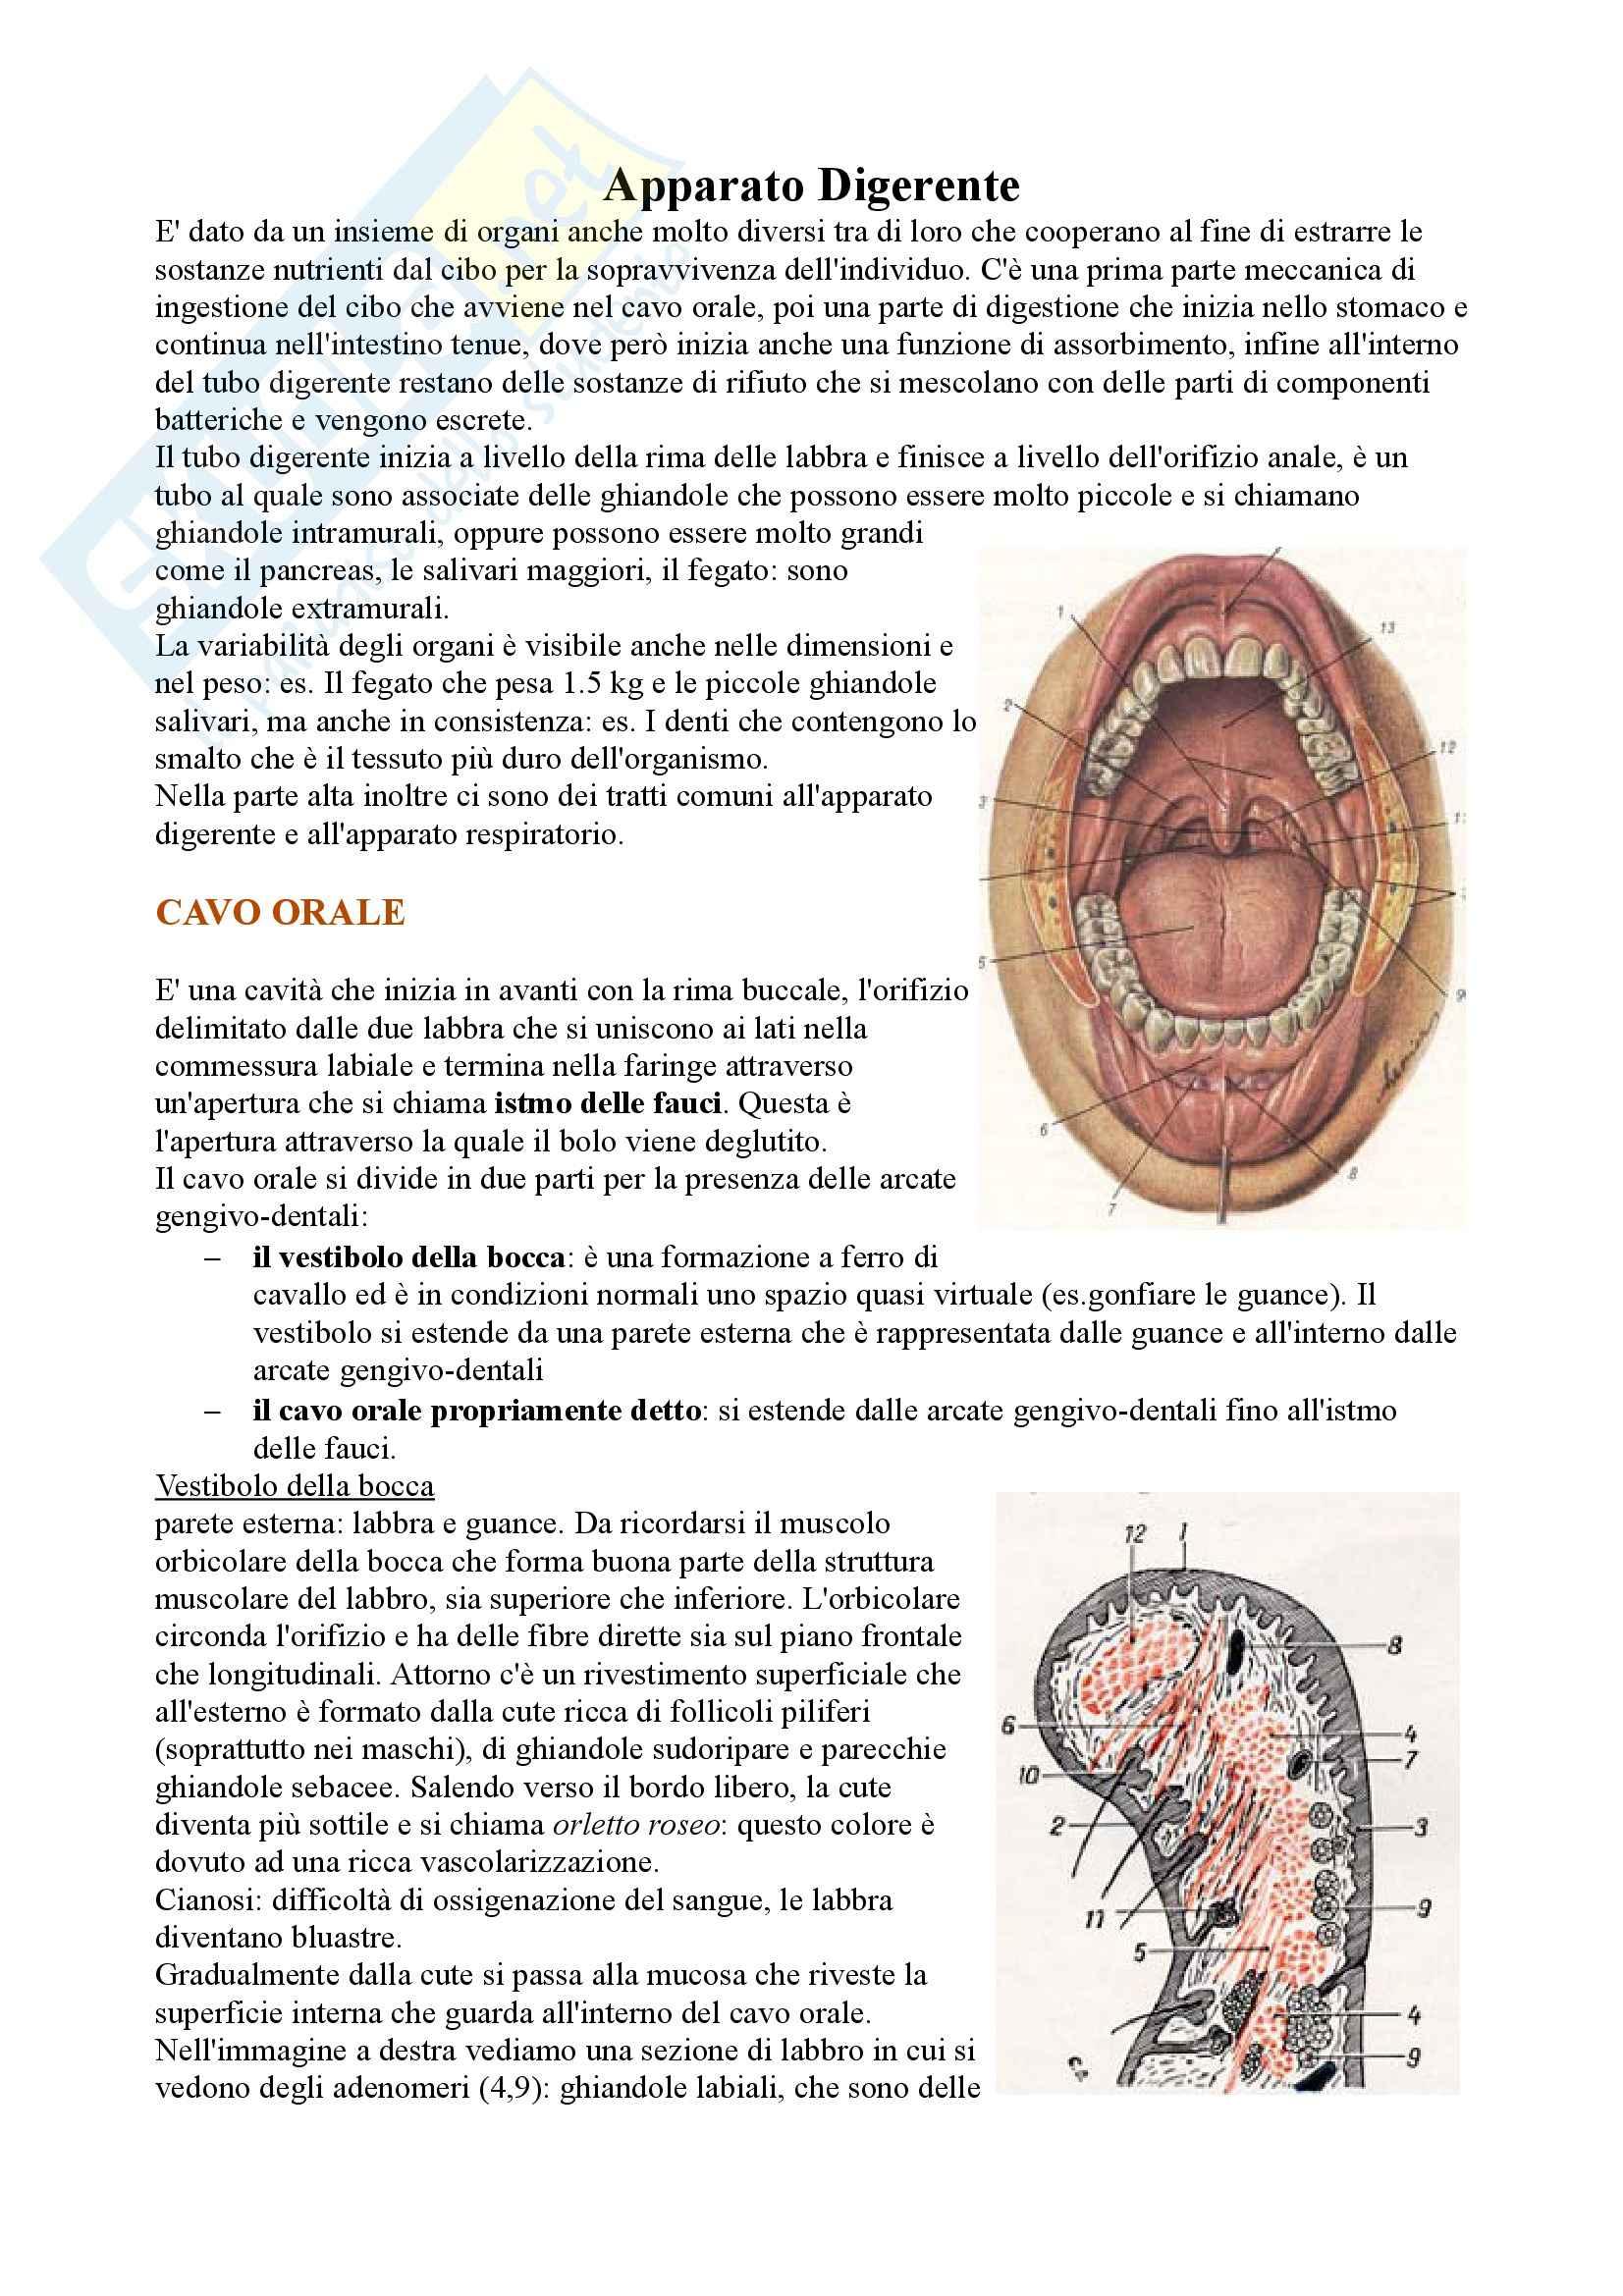 Apparato Digerente, Anatomia